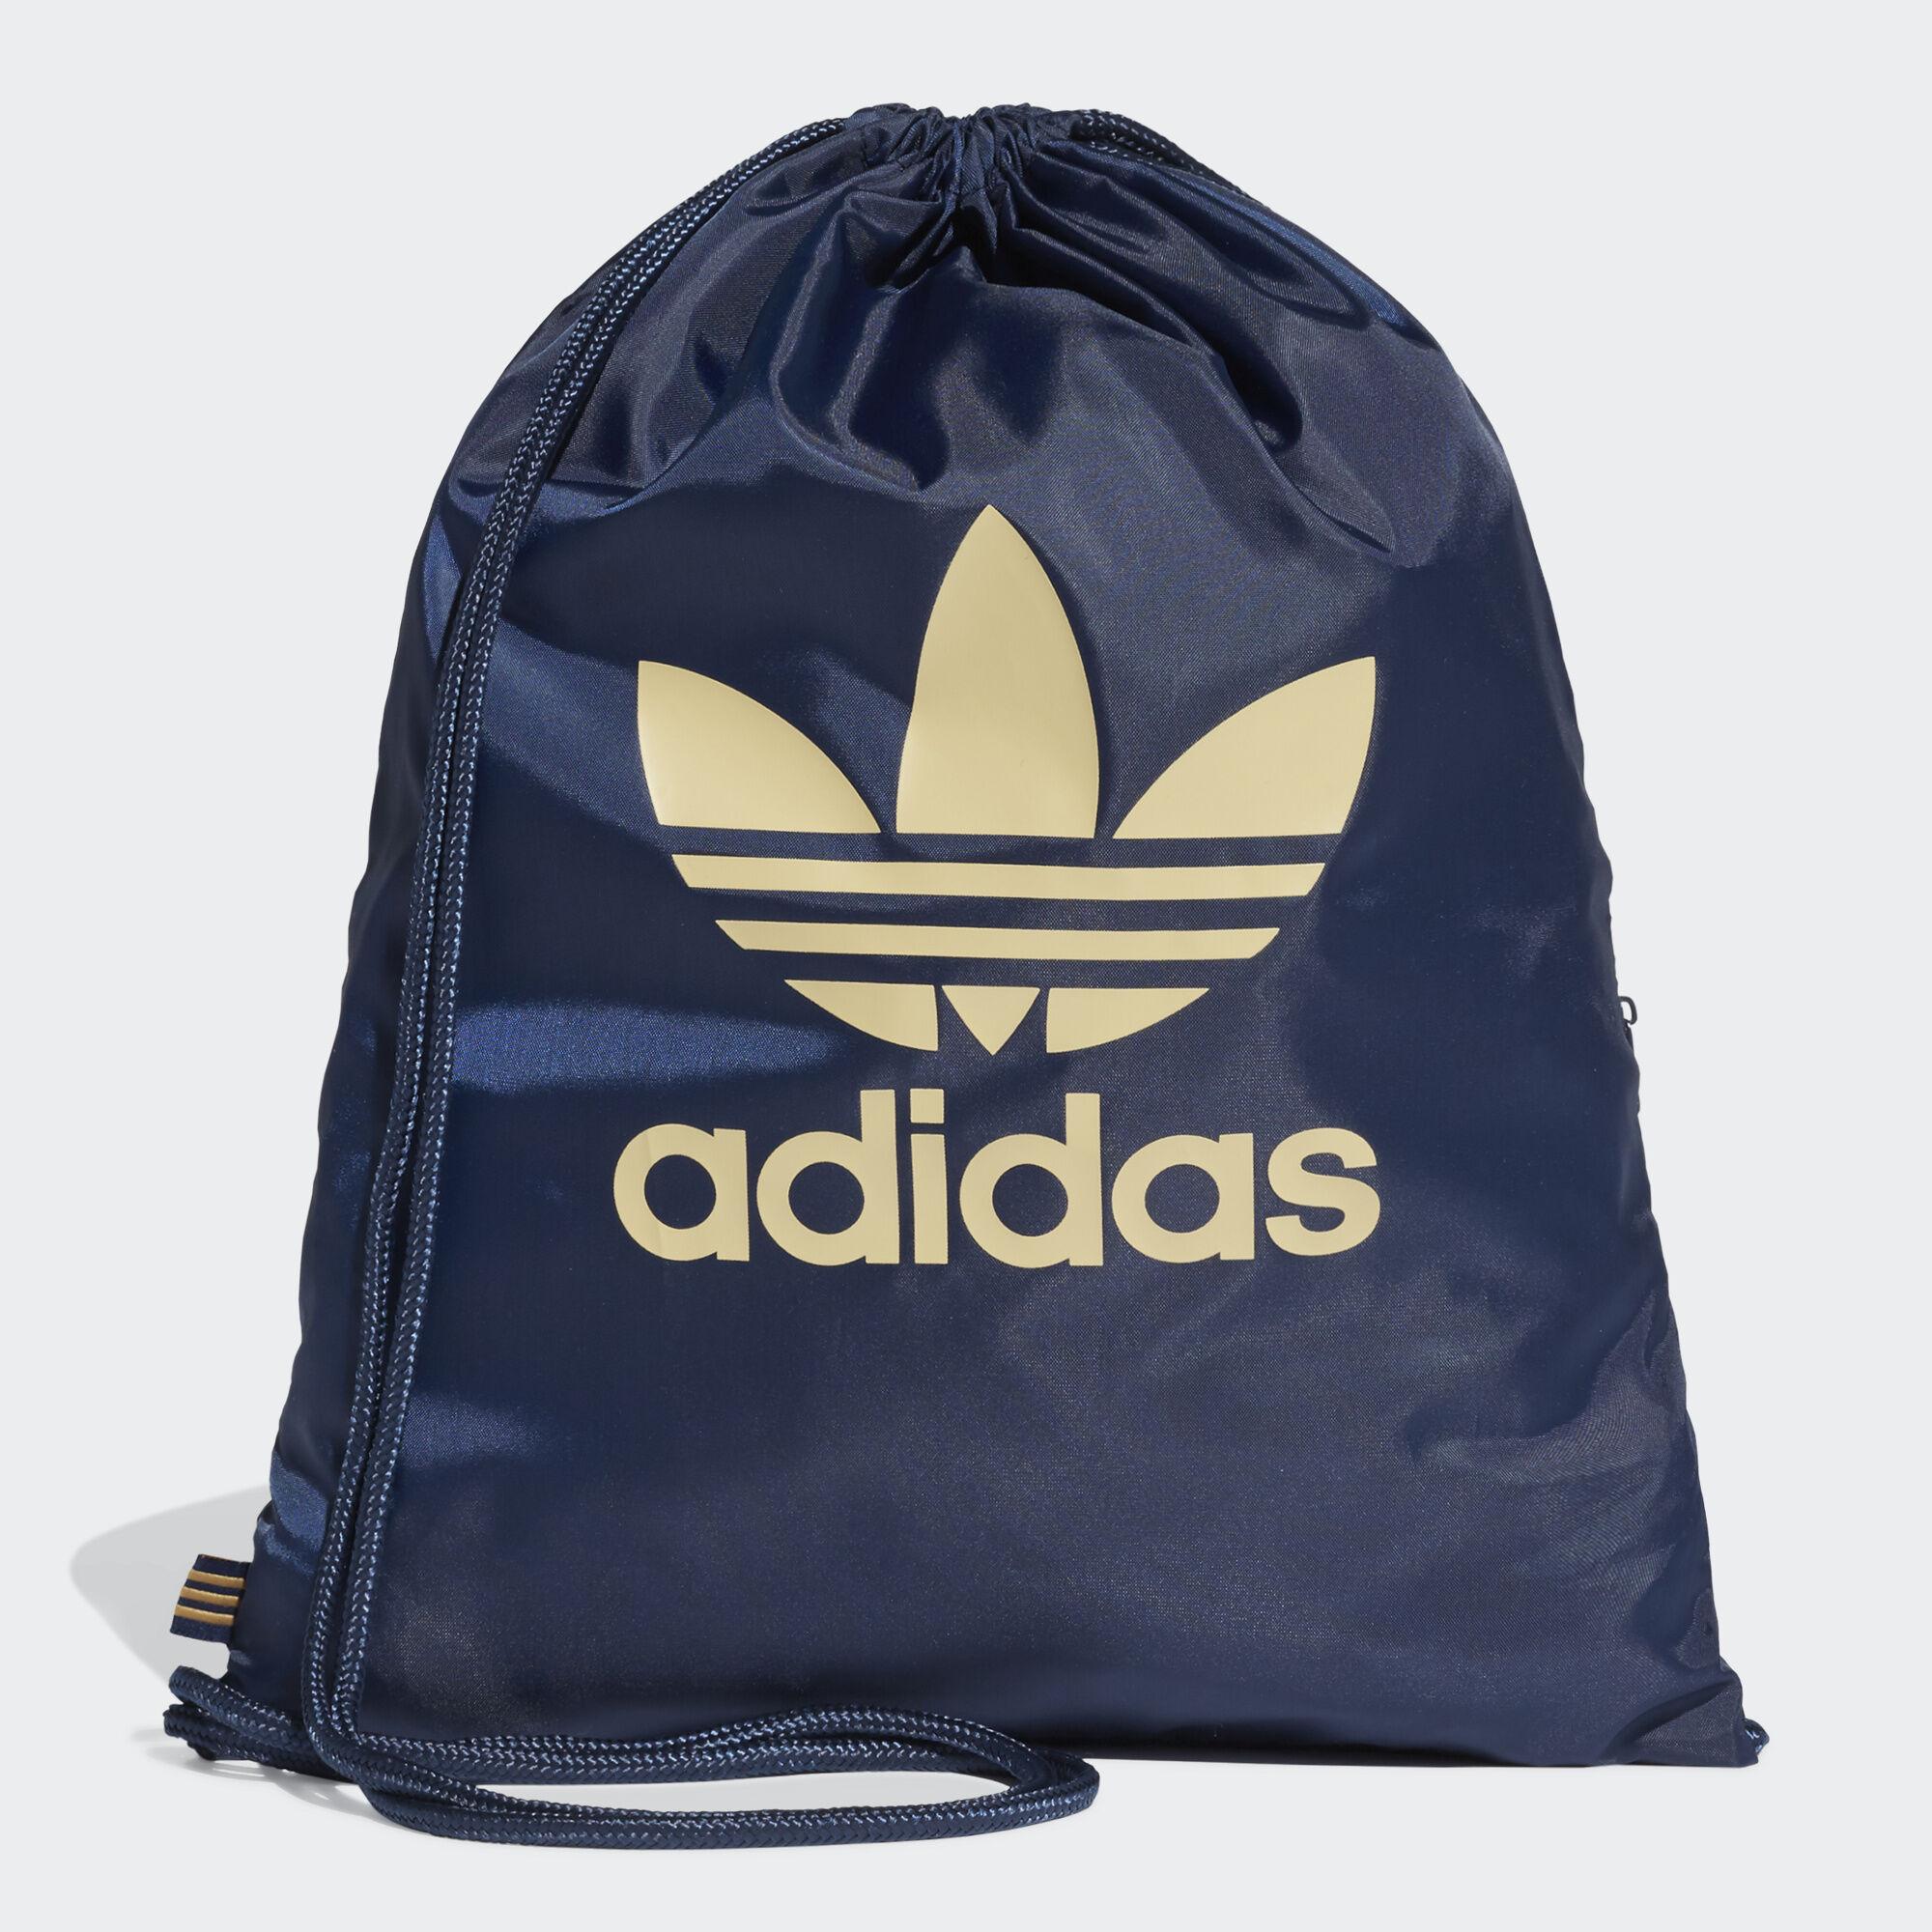 adidas | Сумка-мешок Trefoil adidas Originals | Clouty